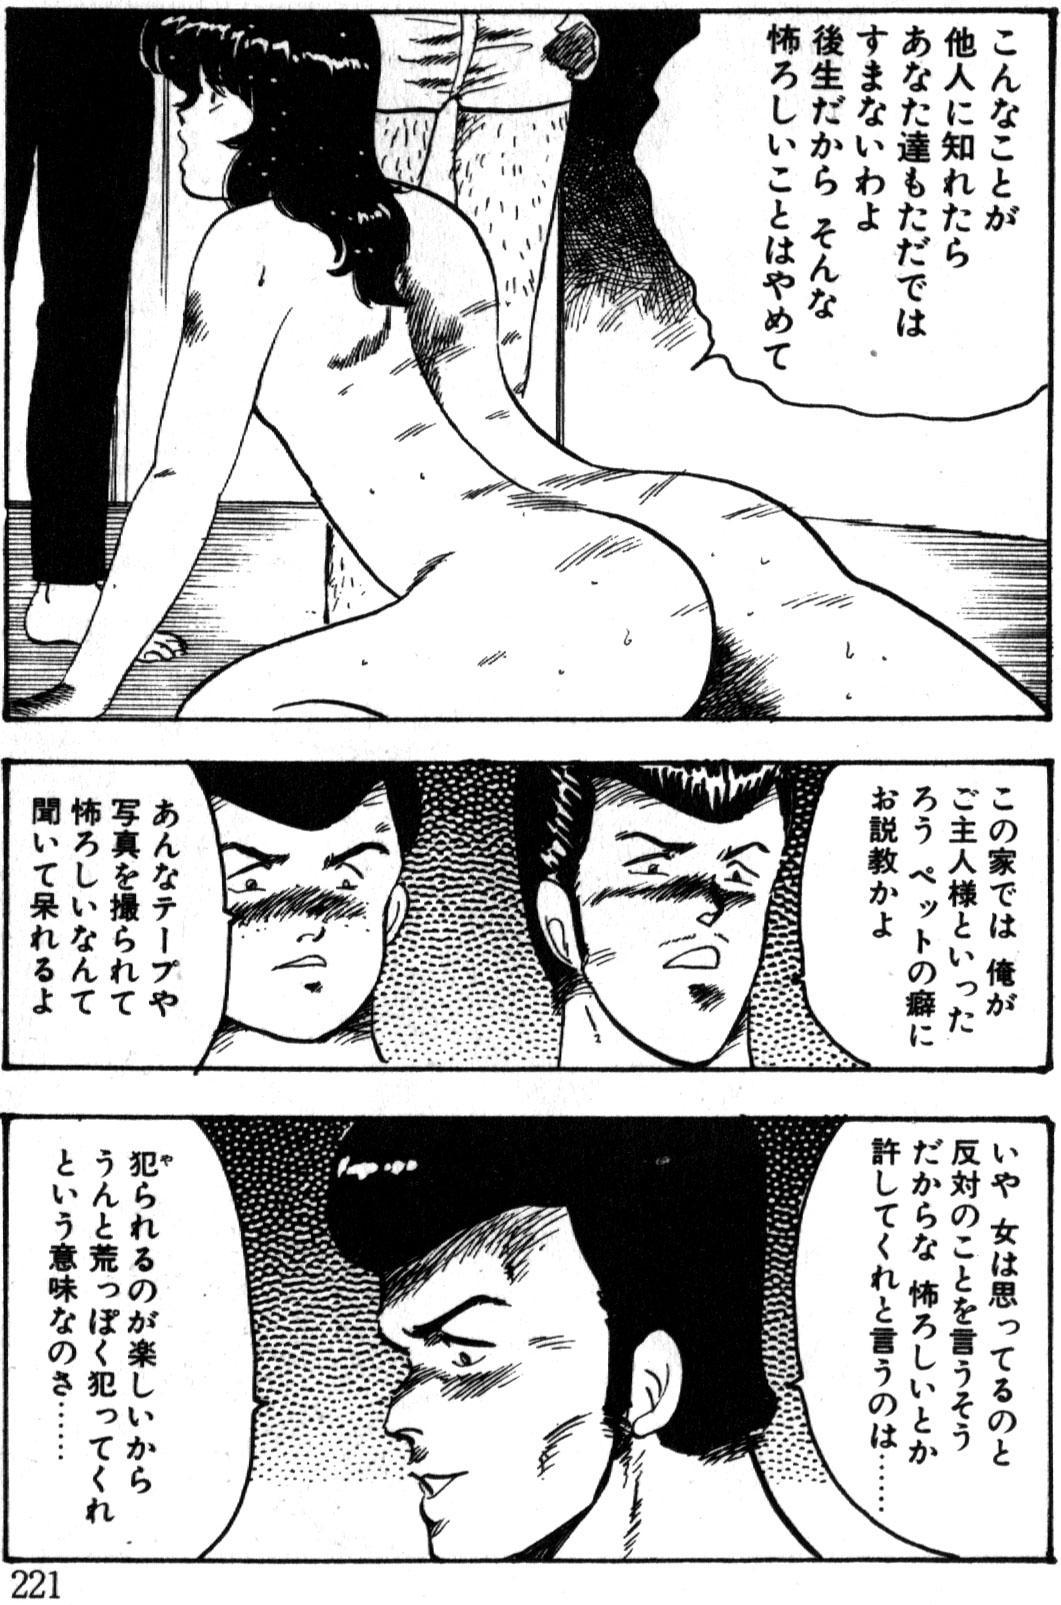 Keiko Sensei no Kagai Jugyou - Keiko Sensei Series 1 220